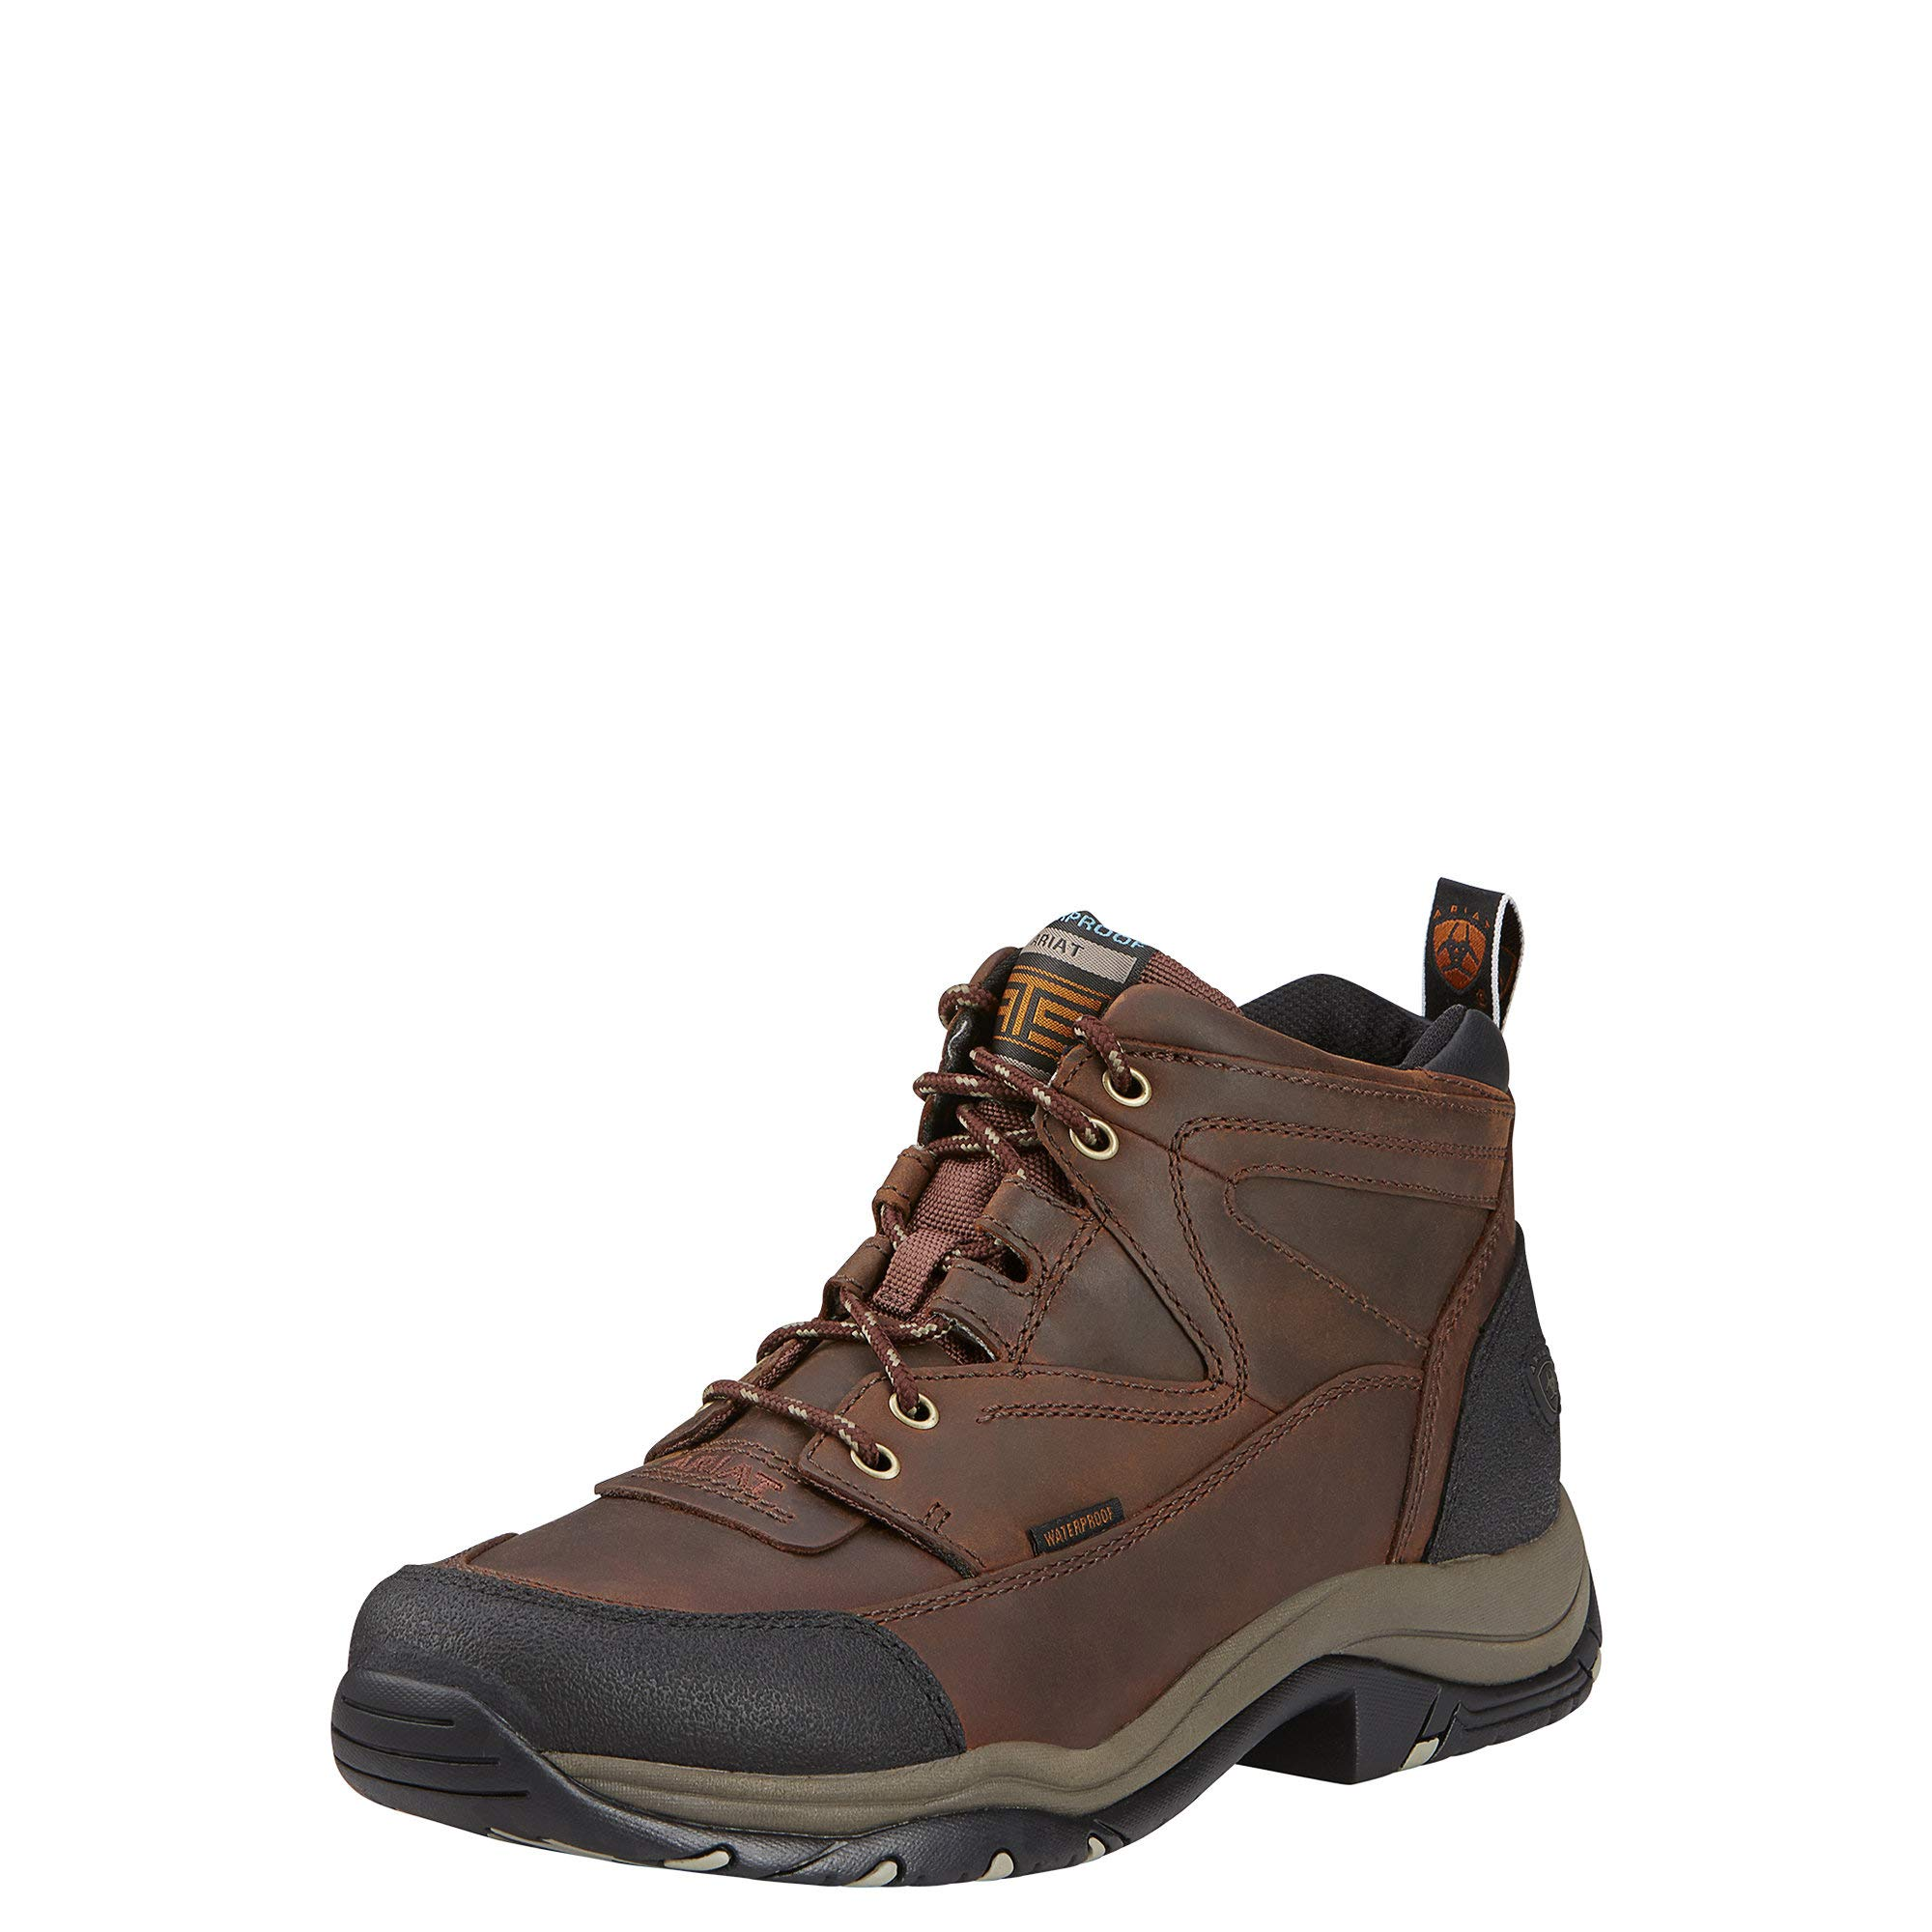 Ariat Men's Terrain H2O Hiking Boot, Copper, 11.5 D US by ARIAT